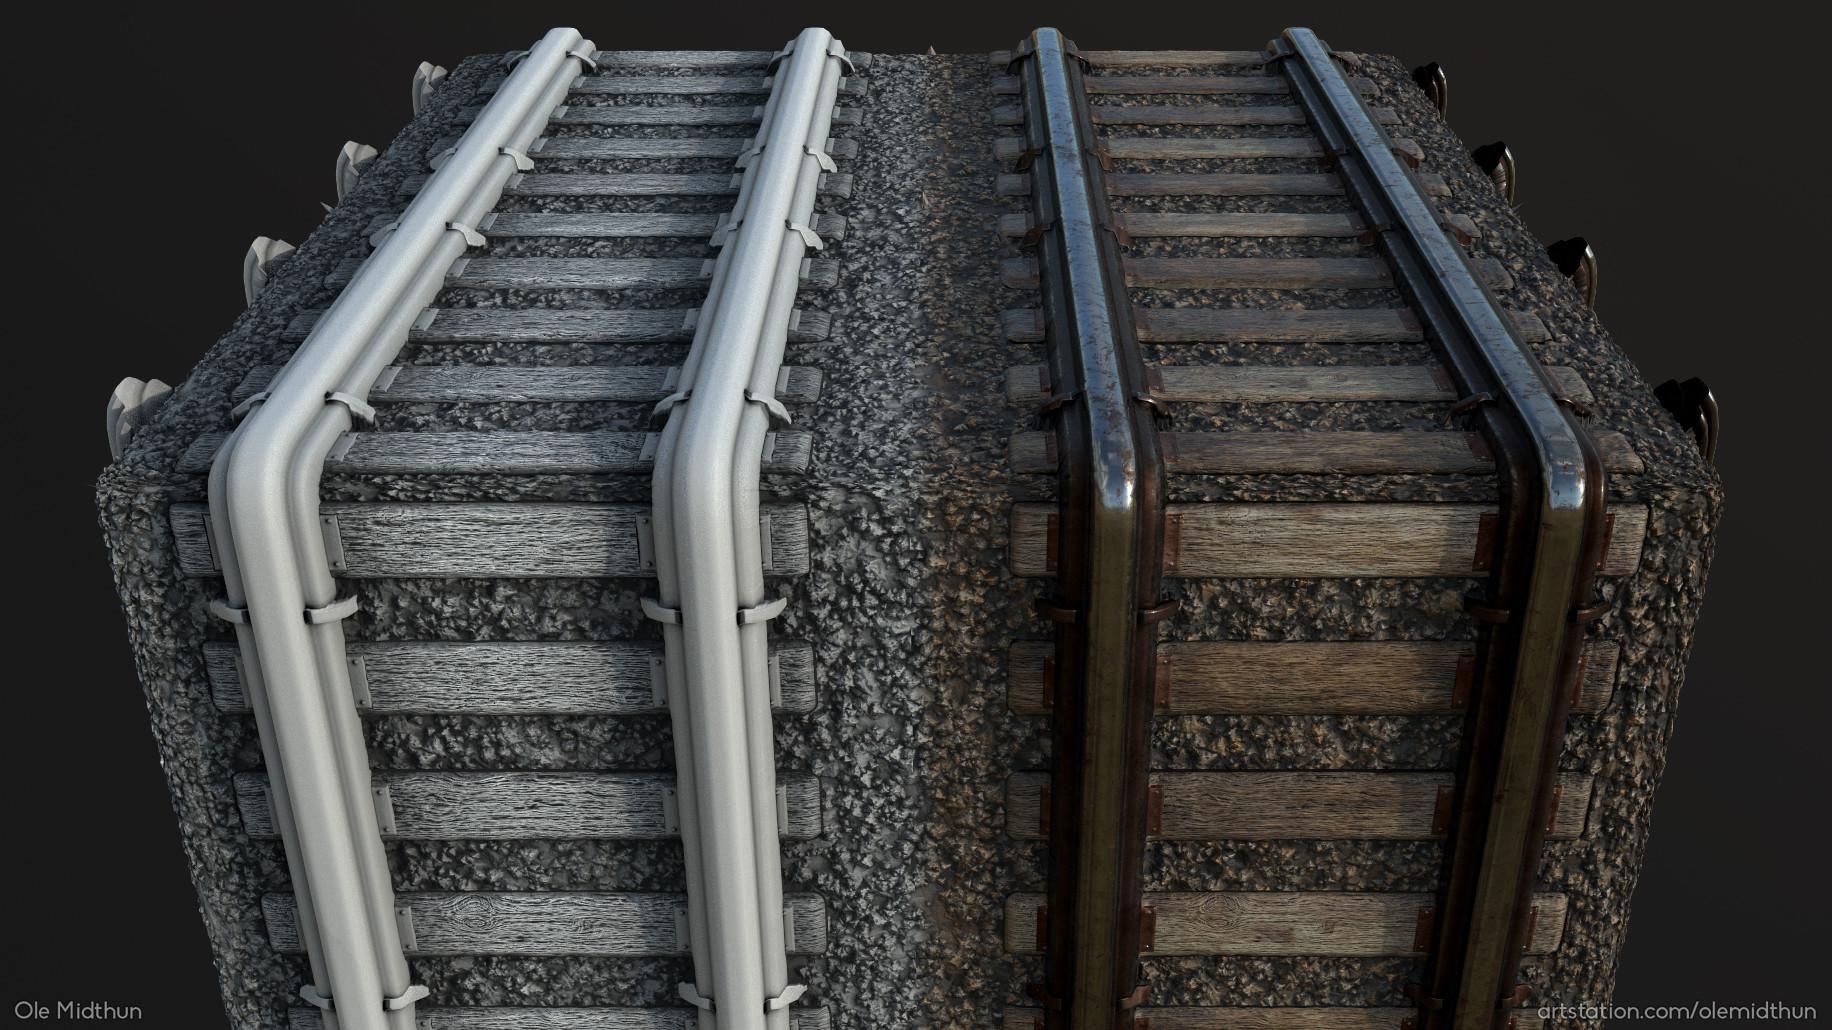 Ole midthun rails render 4